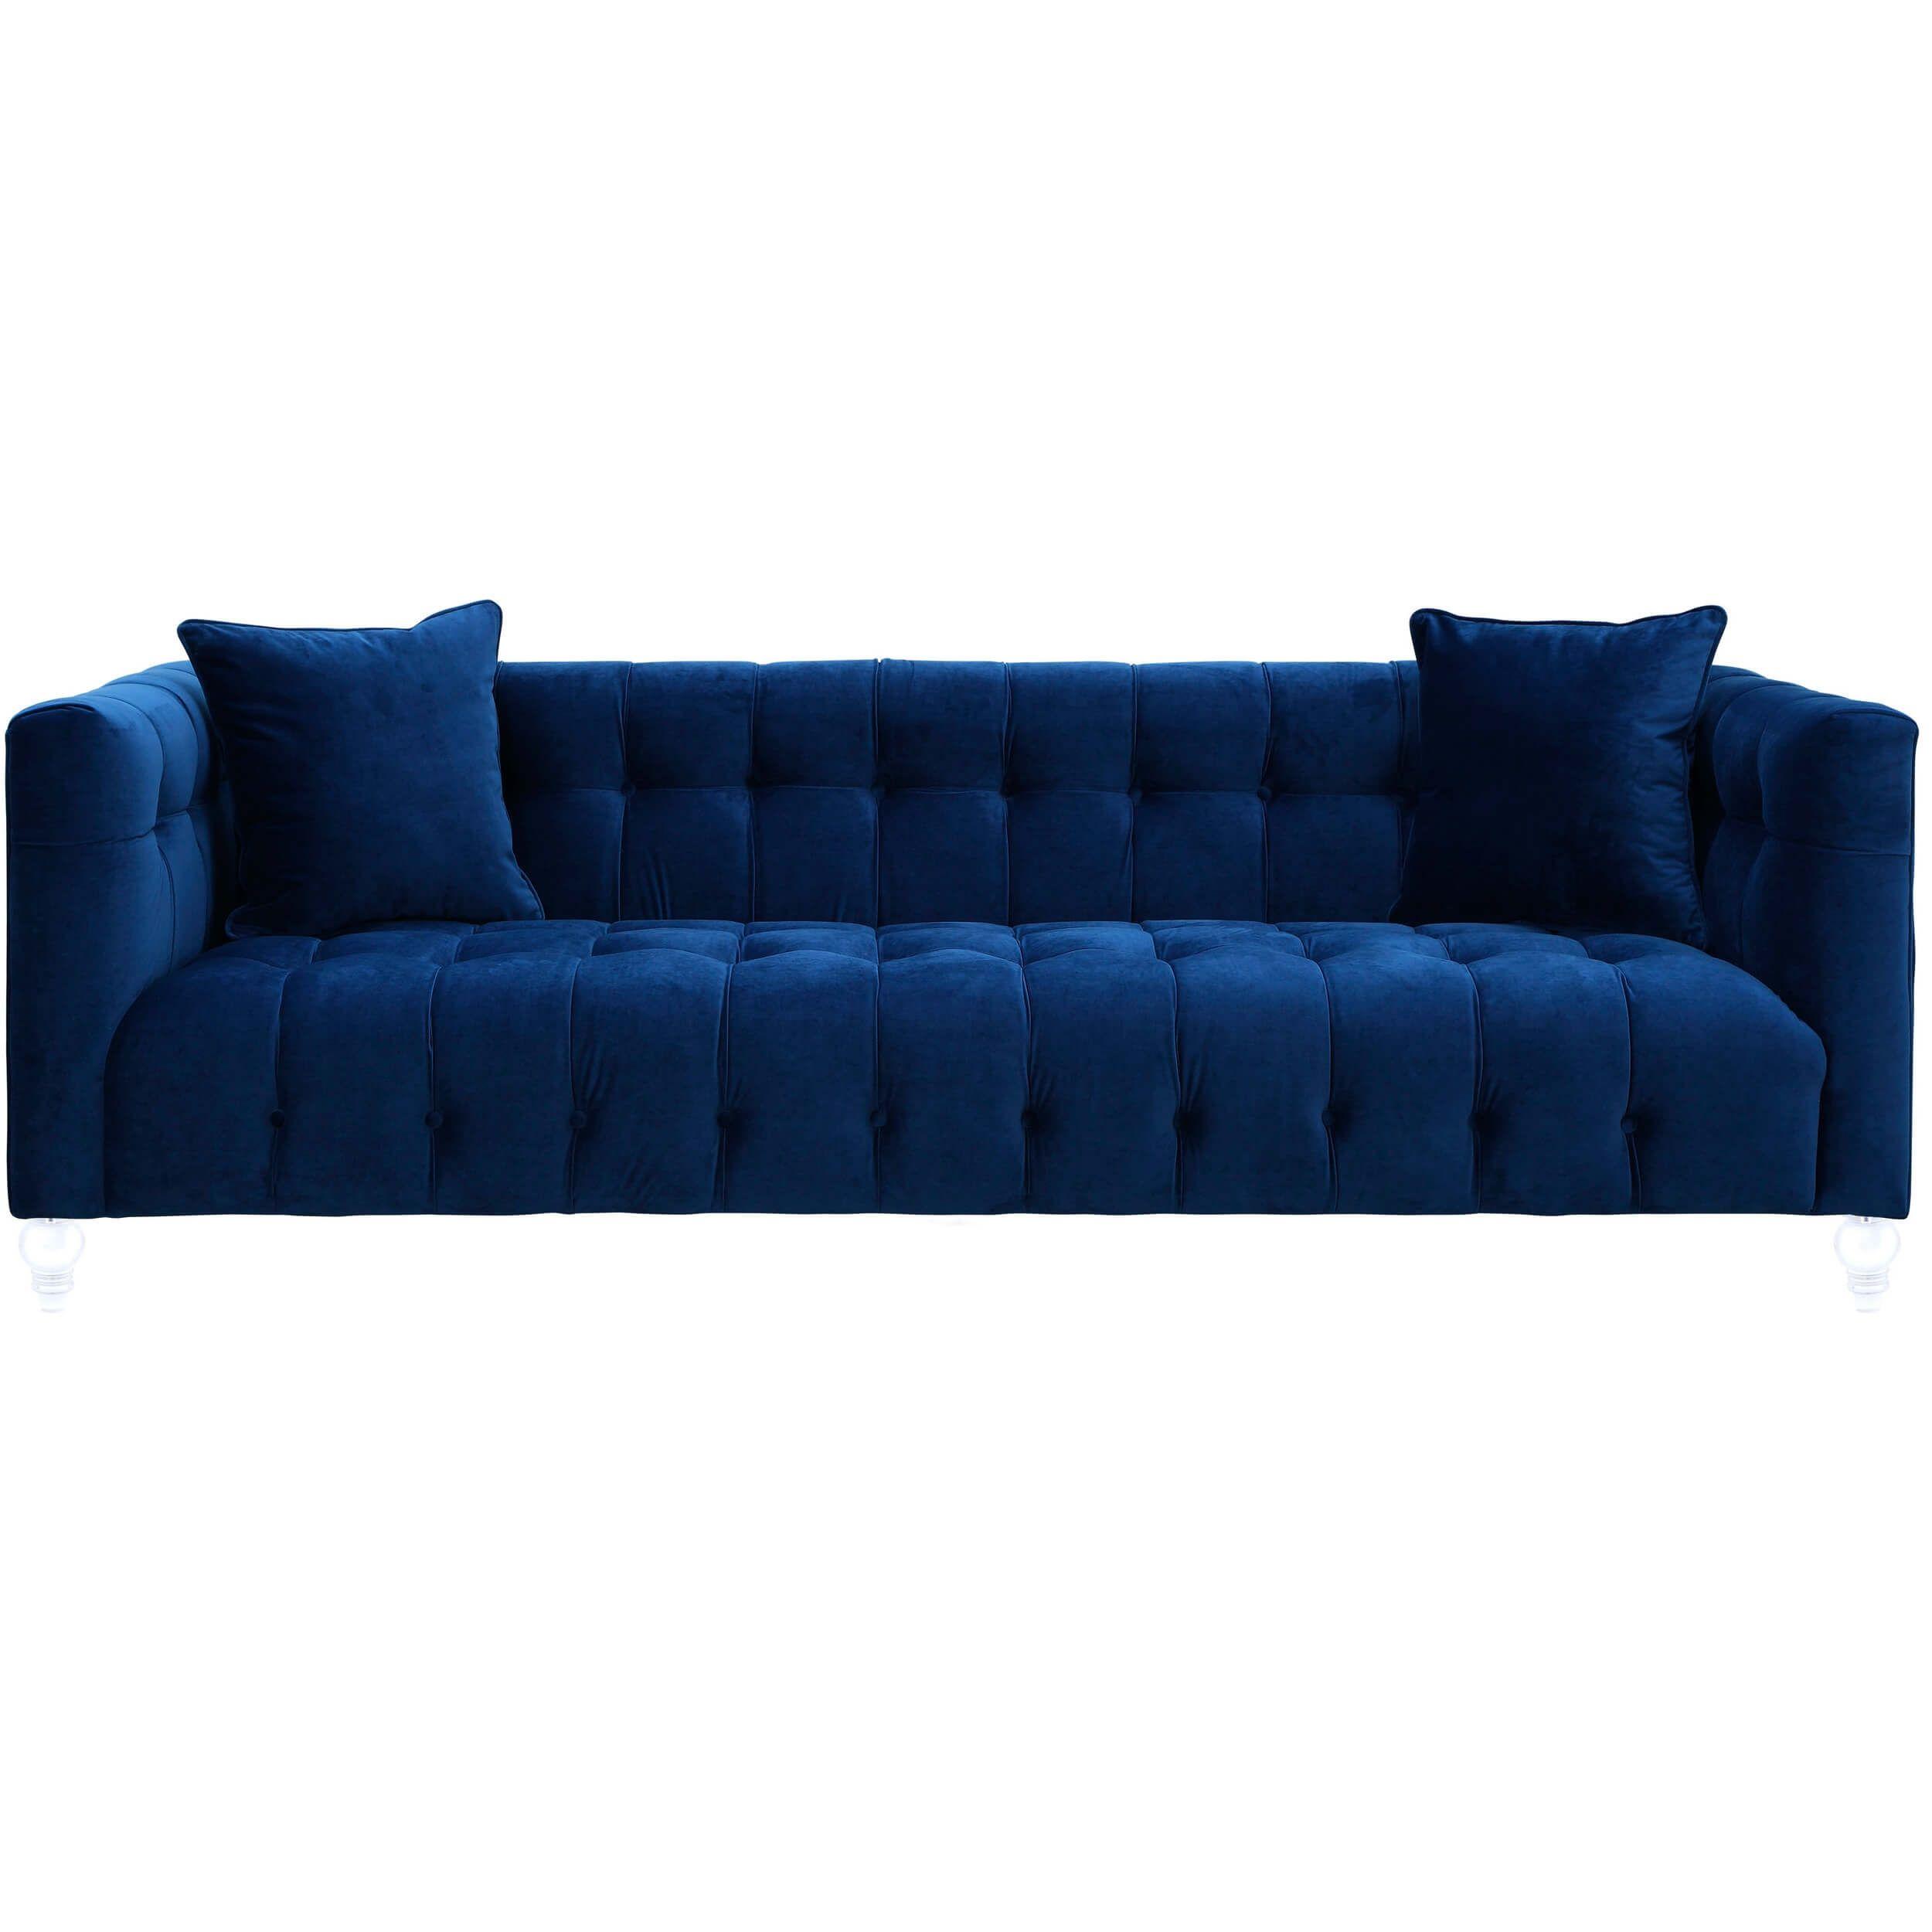 Bea Sofa Navy Recline And Shine Living Room Room Ideas Blue Velvet Sofa Navy Blue Velvet Sofa Velvet Sofa